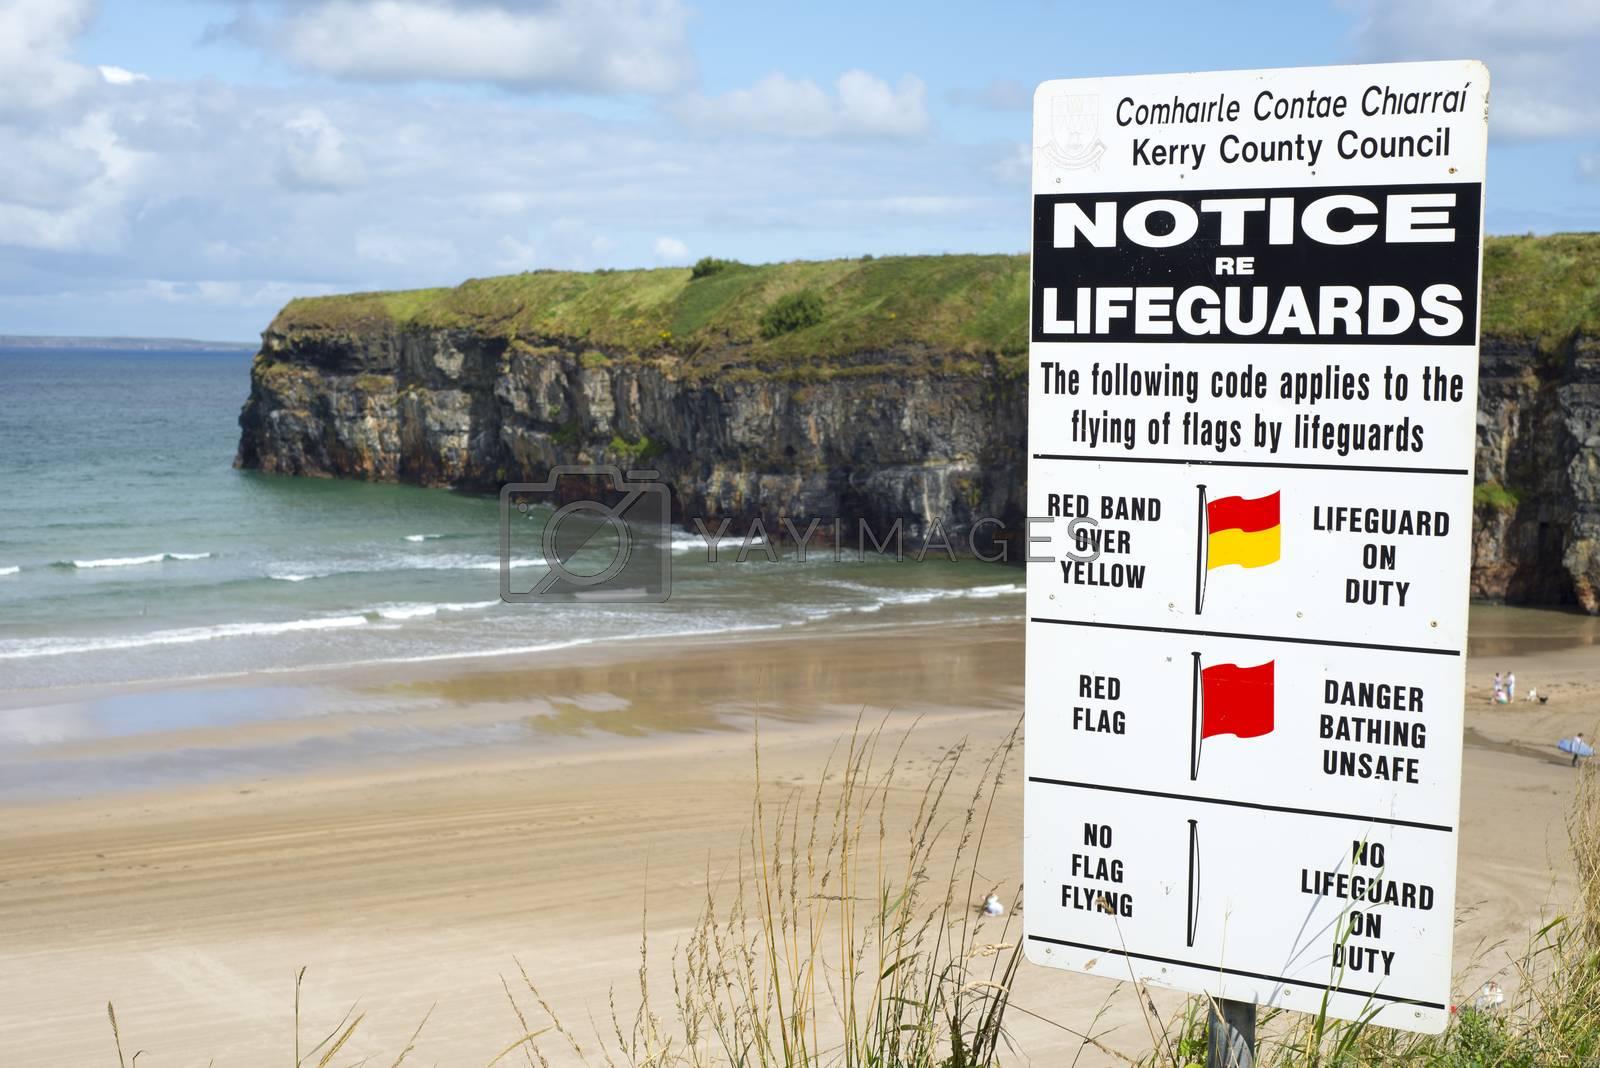 lifeguards notice at ballybunion beach in county kerry ireland on the wild atlantic way